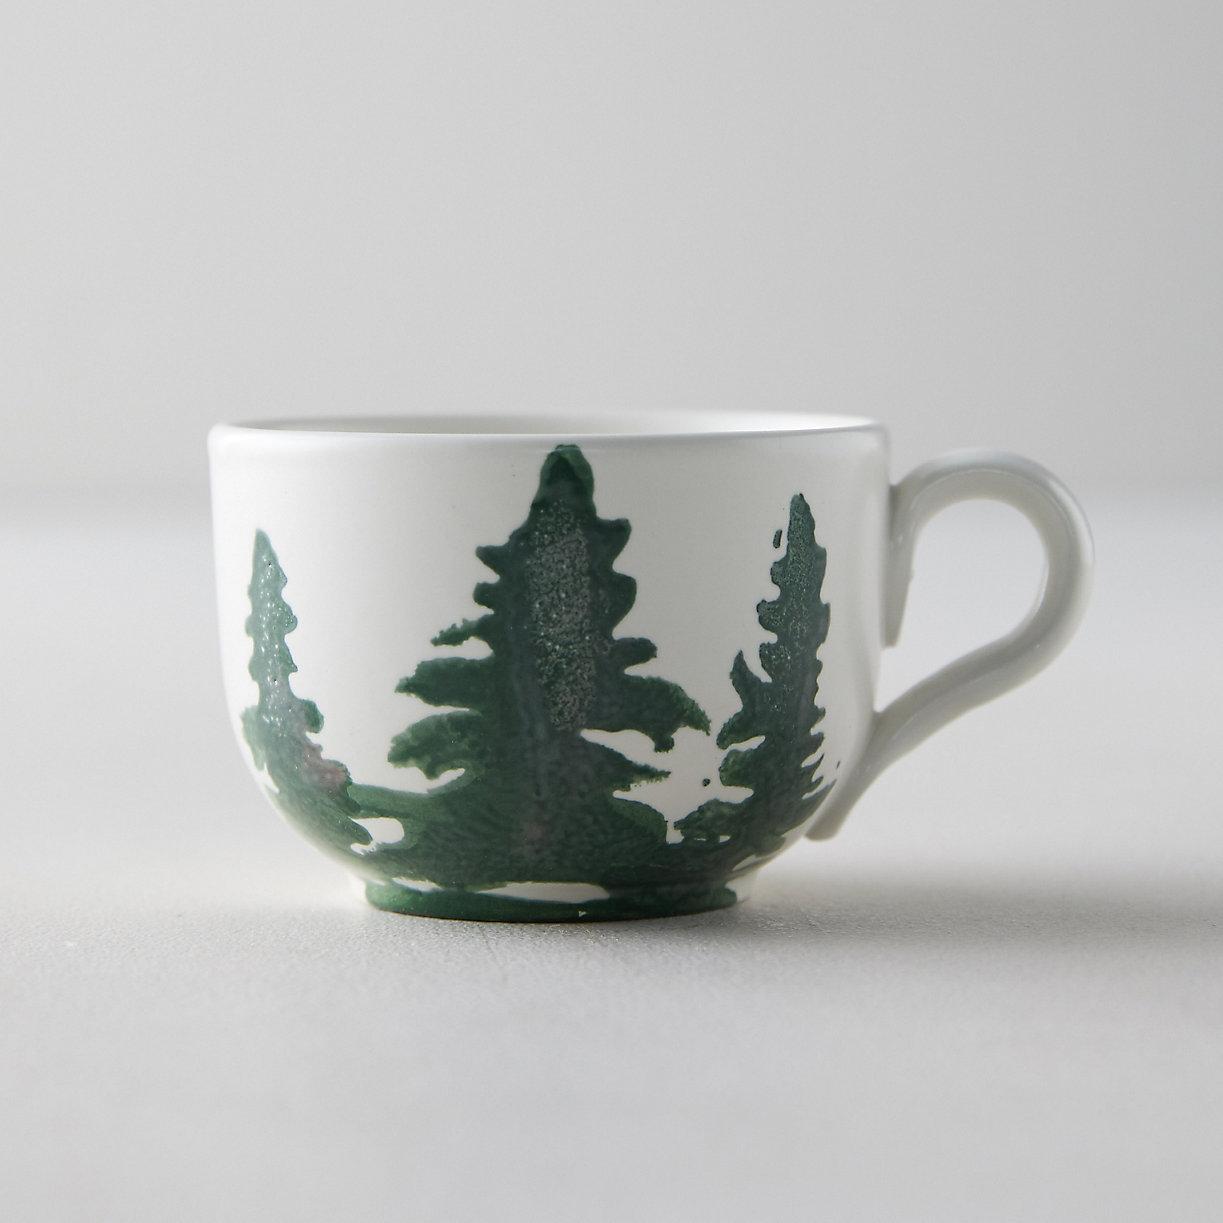 Simple Winter coffee mug for gift